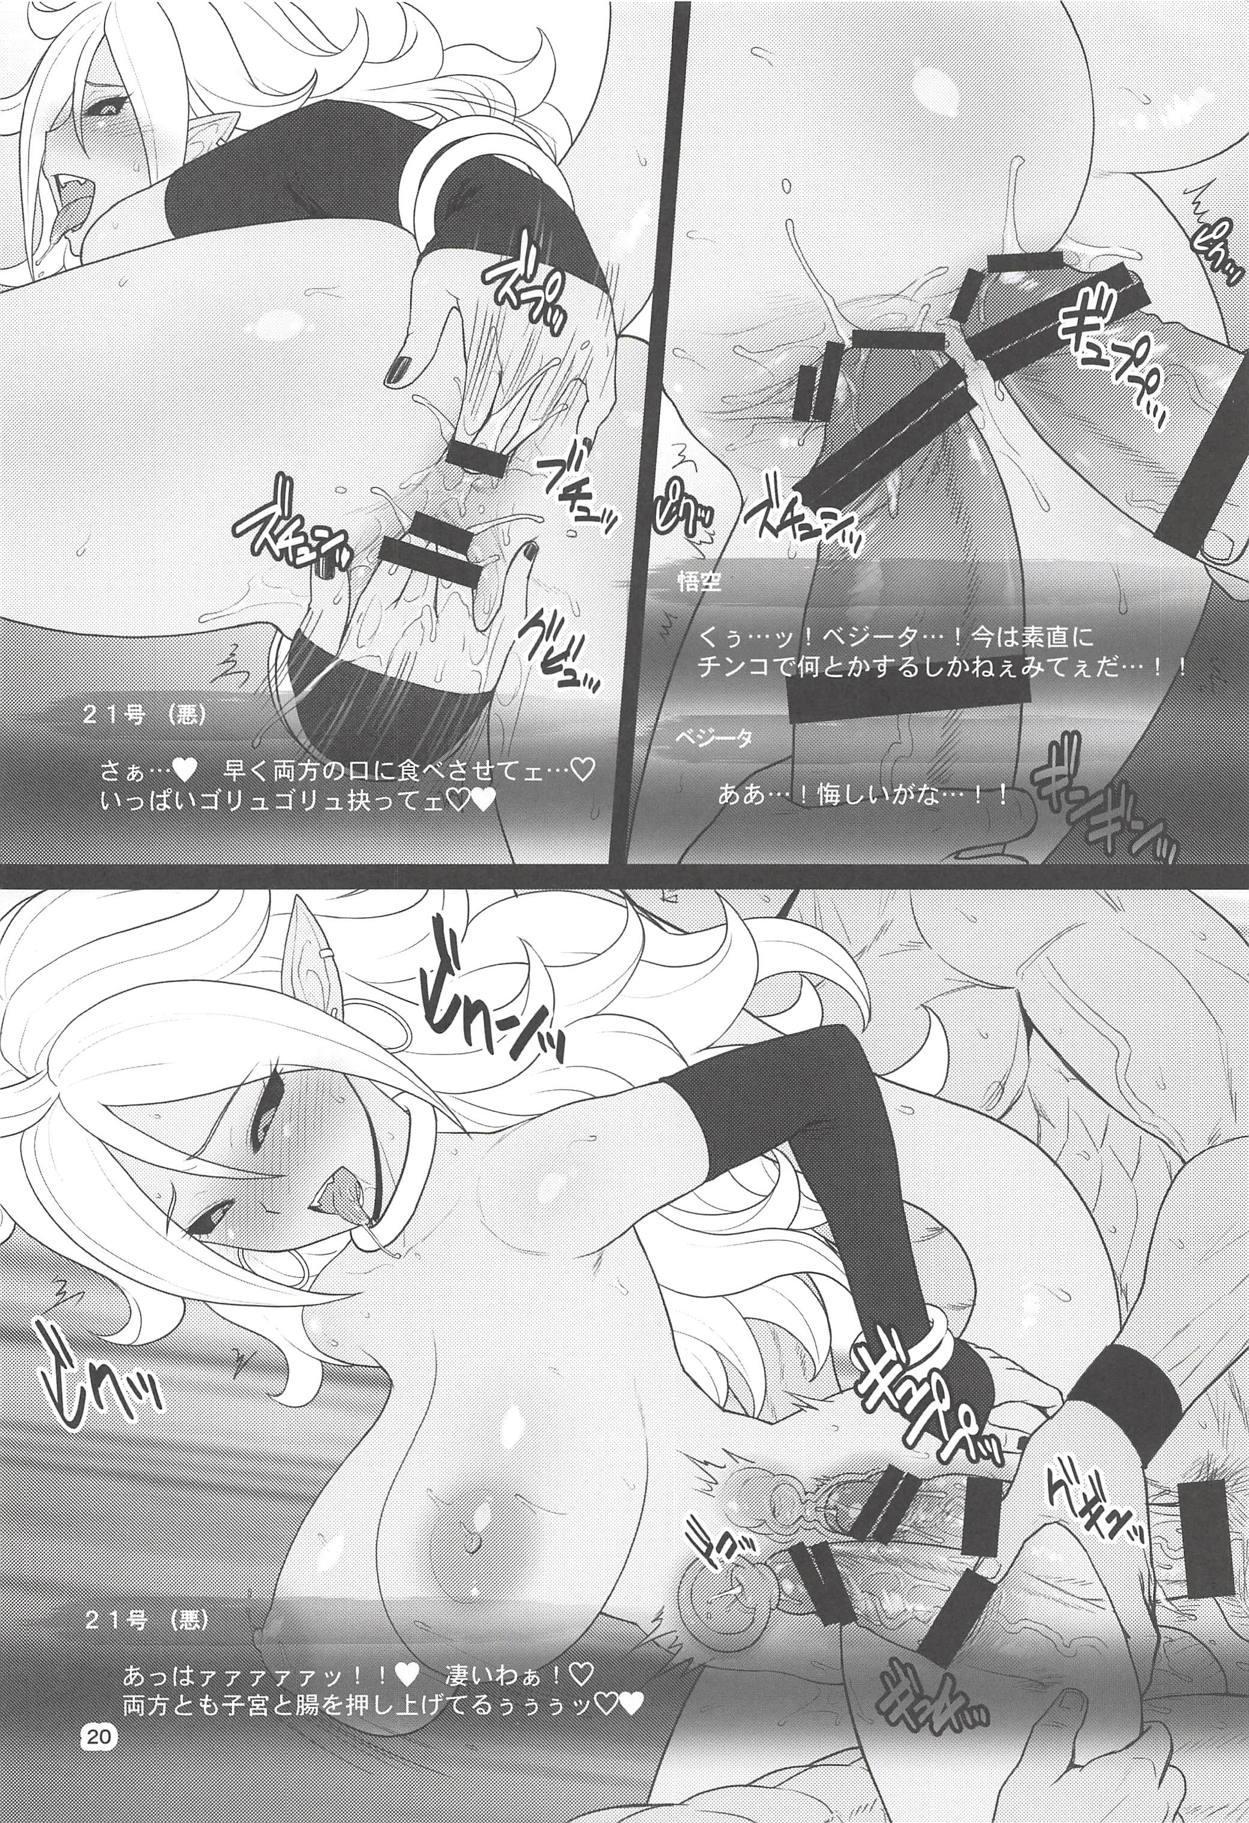 (C94) [Shinnihon Pepsitou (St.germain-sal)] 1-tsubu de 2-do Oishii (Dragon Ball FighterZ) 18